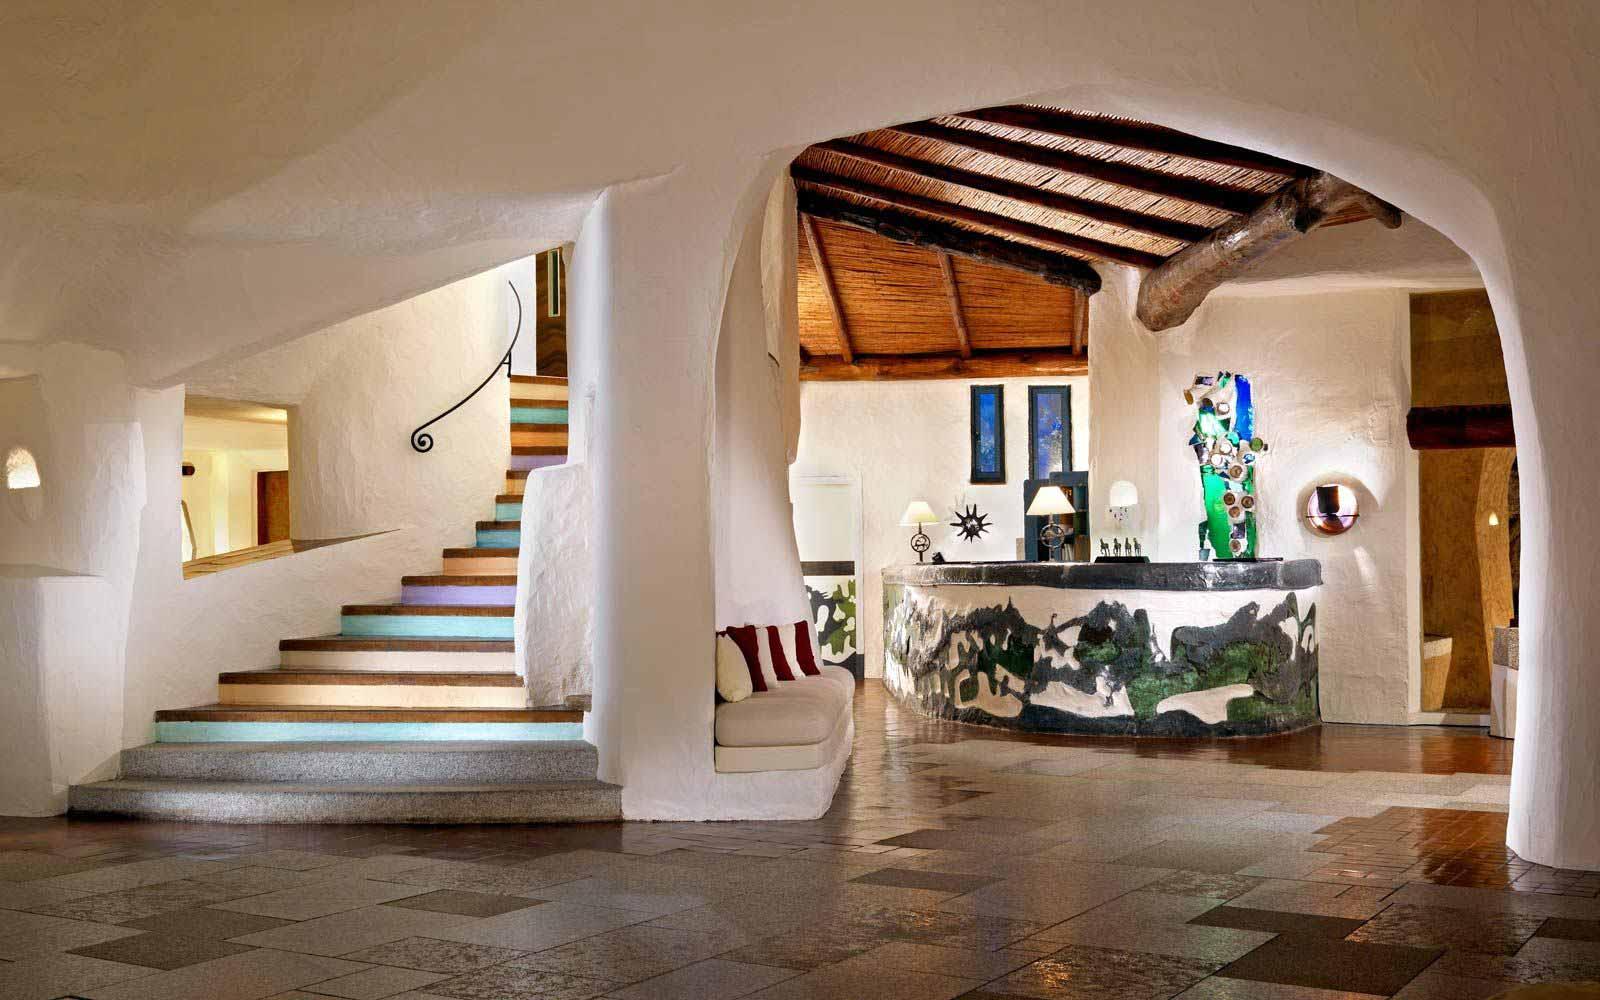 Hotel Cala Di Volpe Costa Smeralda 5* Luxury Beach Resort. Best Western Plus  St. Raphael. Chalet Maretse. The Frangipani Living Arts Hotel And Spa. Verwohnhotel Goies